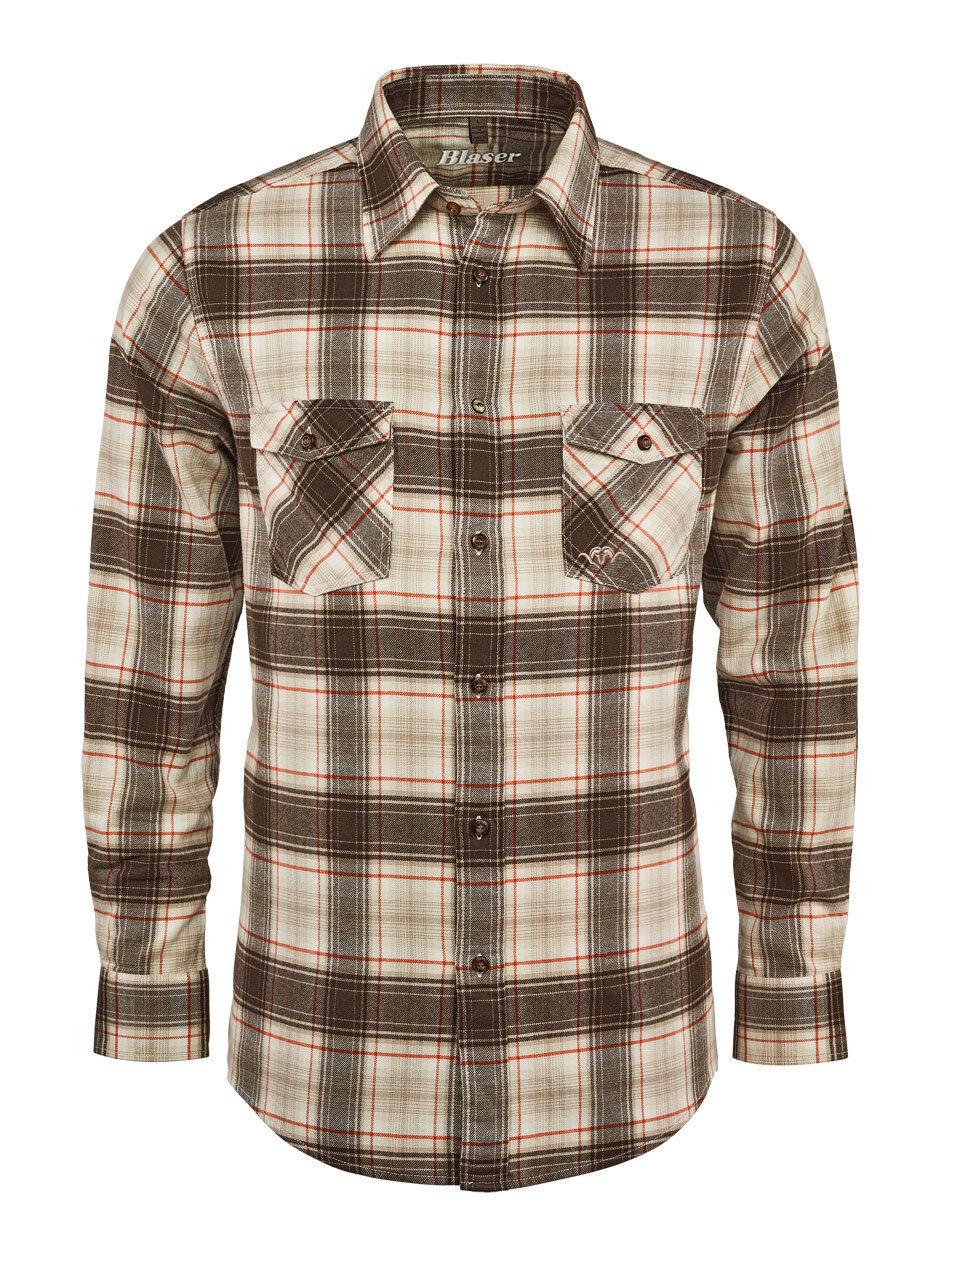 Blaser Twill Camicia Thomas - Classic - Beige Marroneekariert - 118062-087